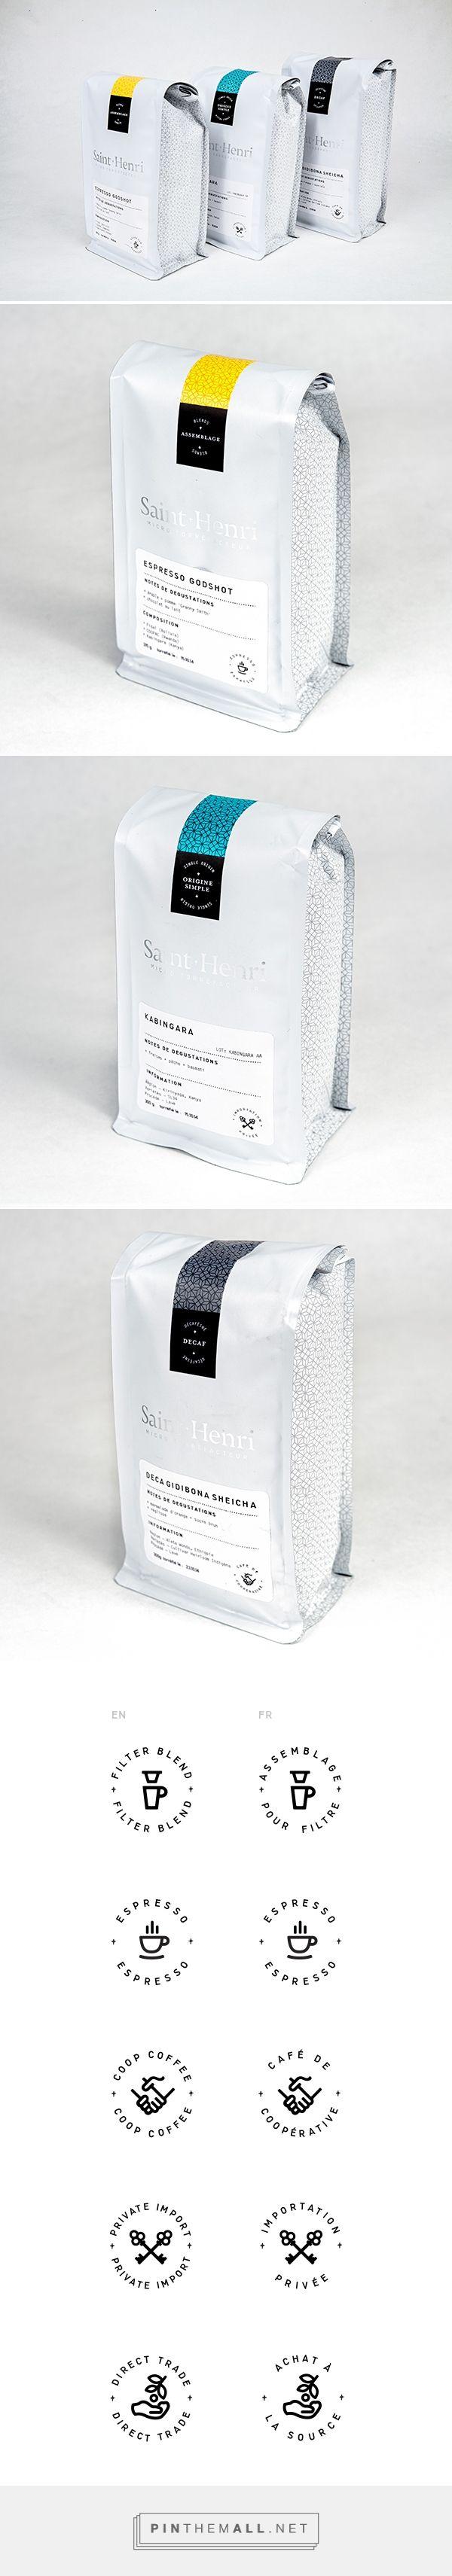 Cafe St. Henri Packaging on Behance - created via https://pinthemall.net